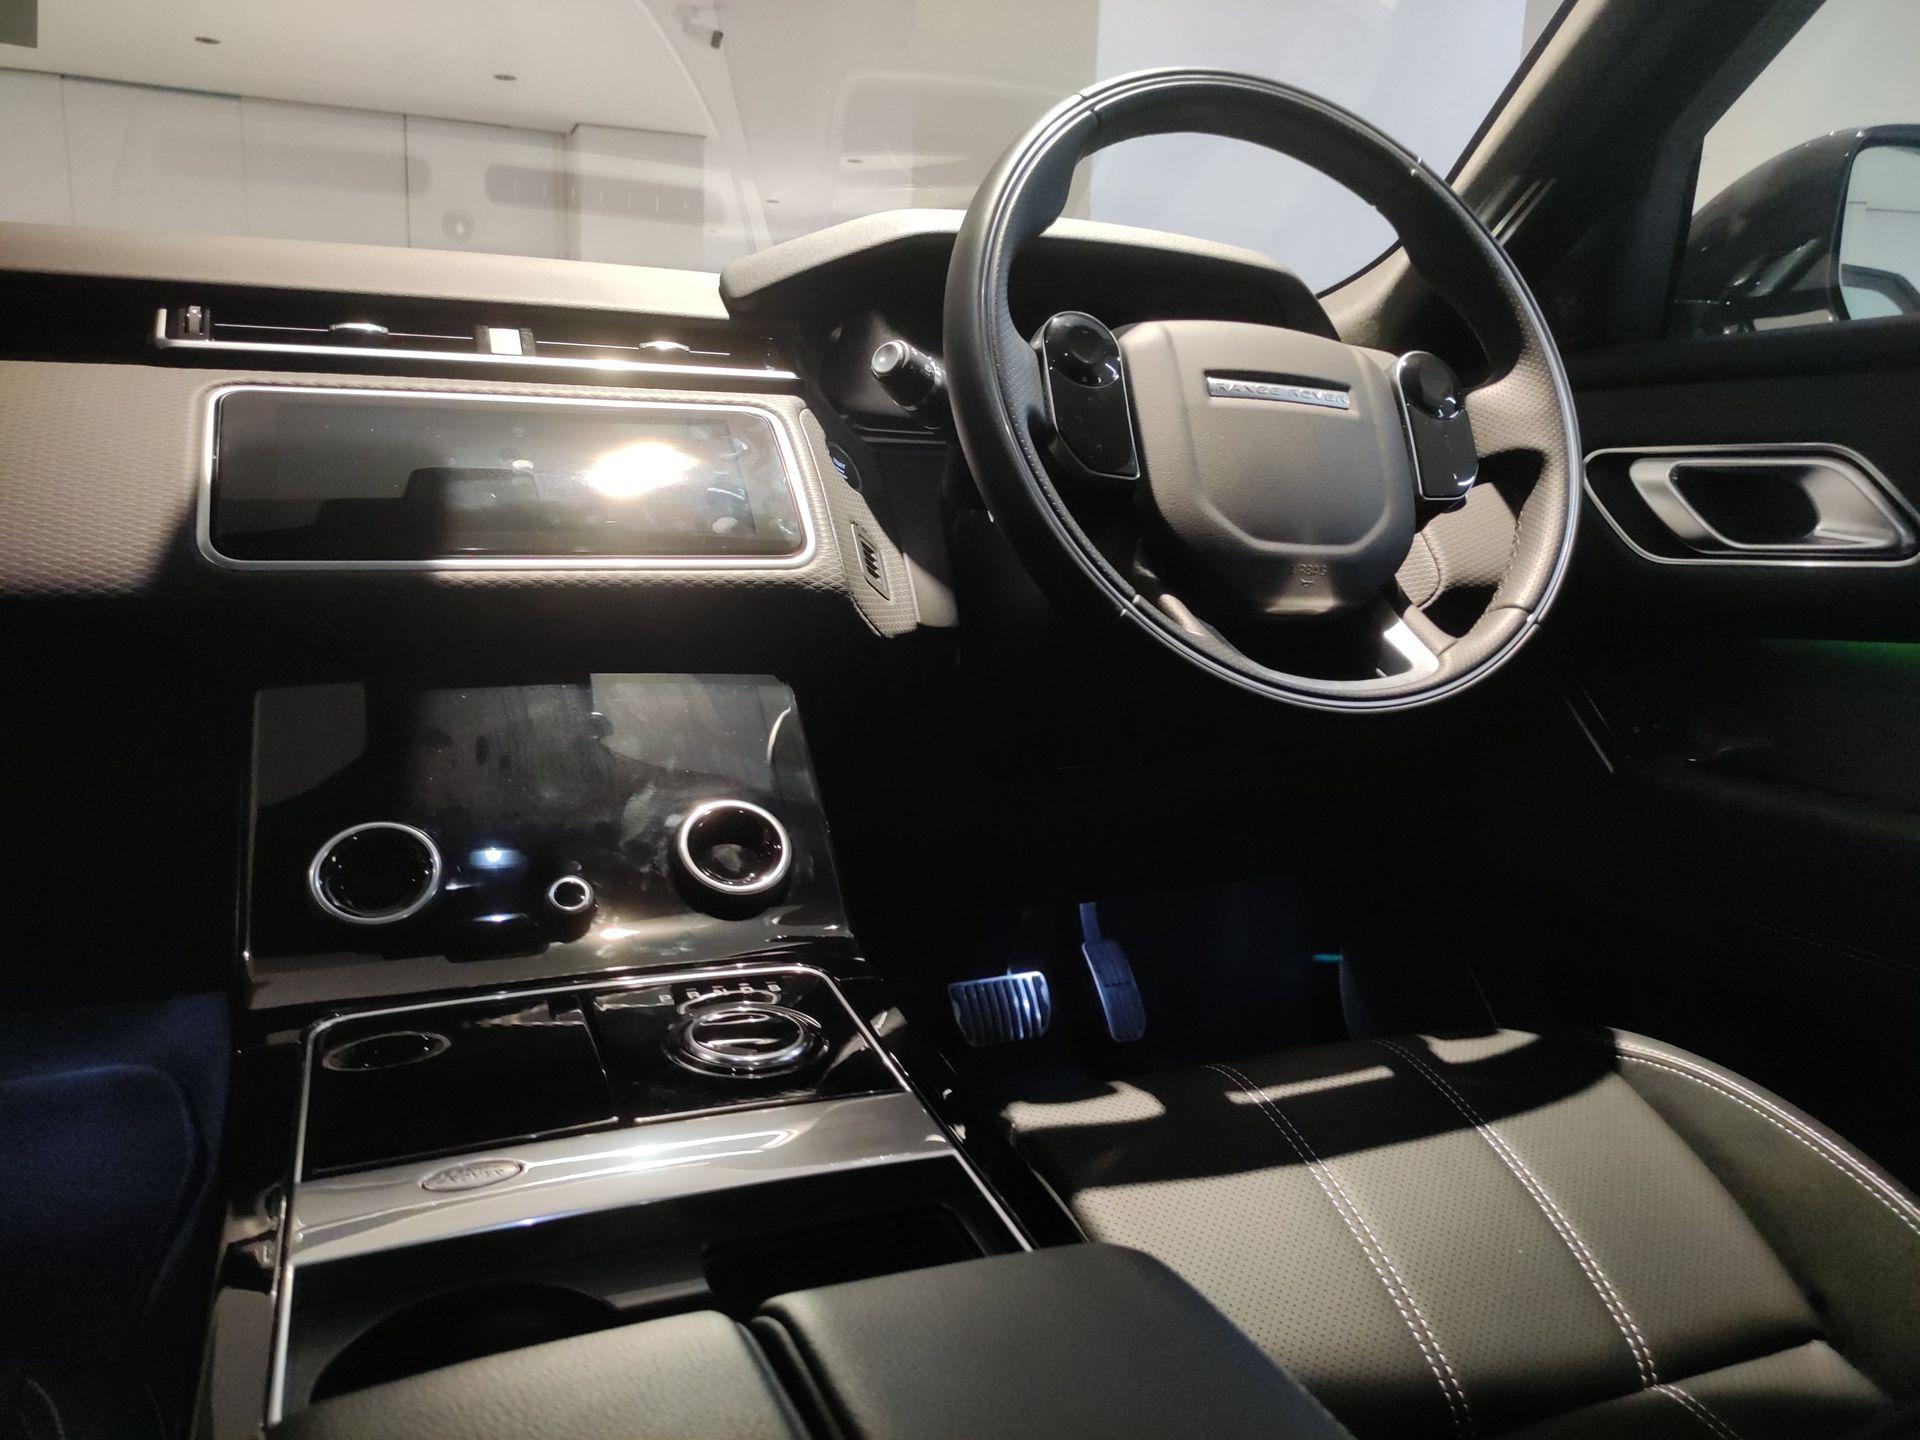 2019 Land Rover Range Rover Velar 2.0L Petrol